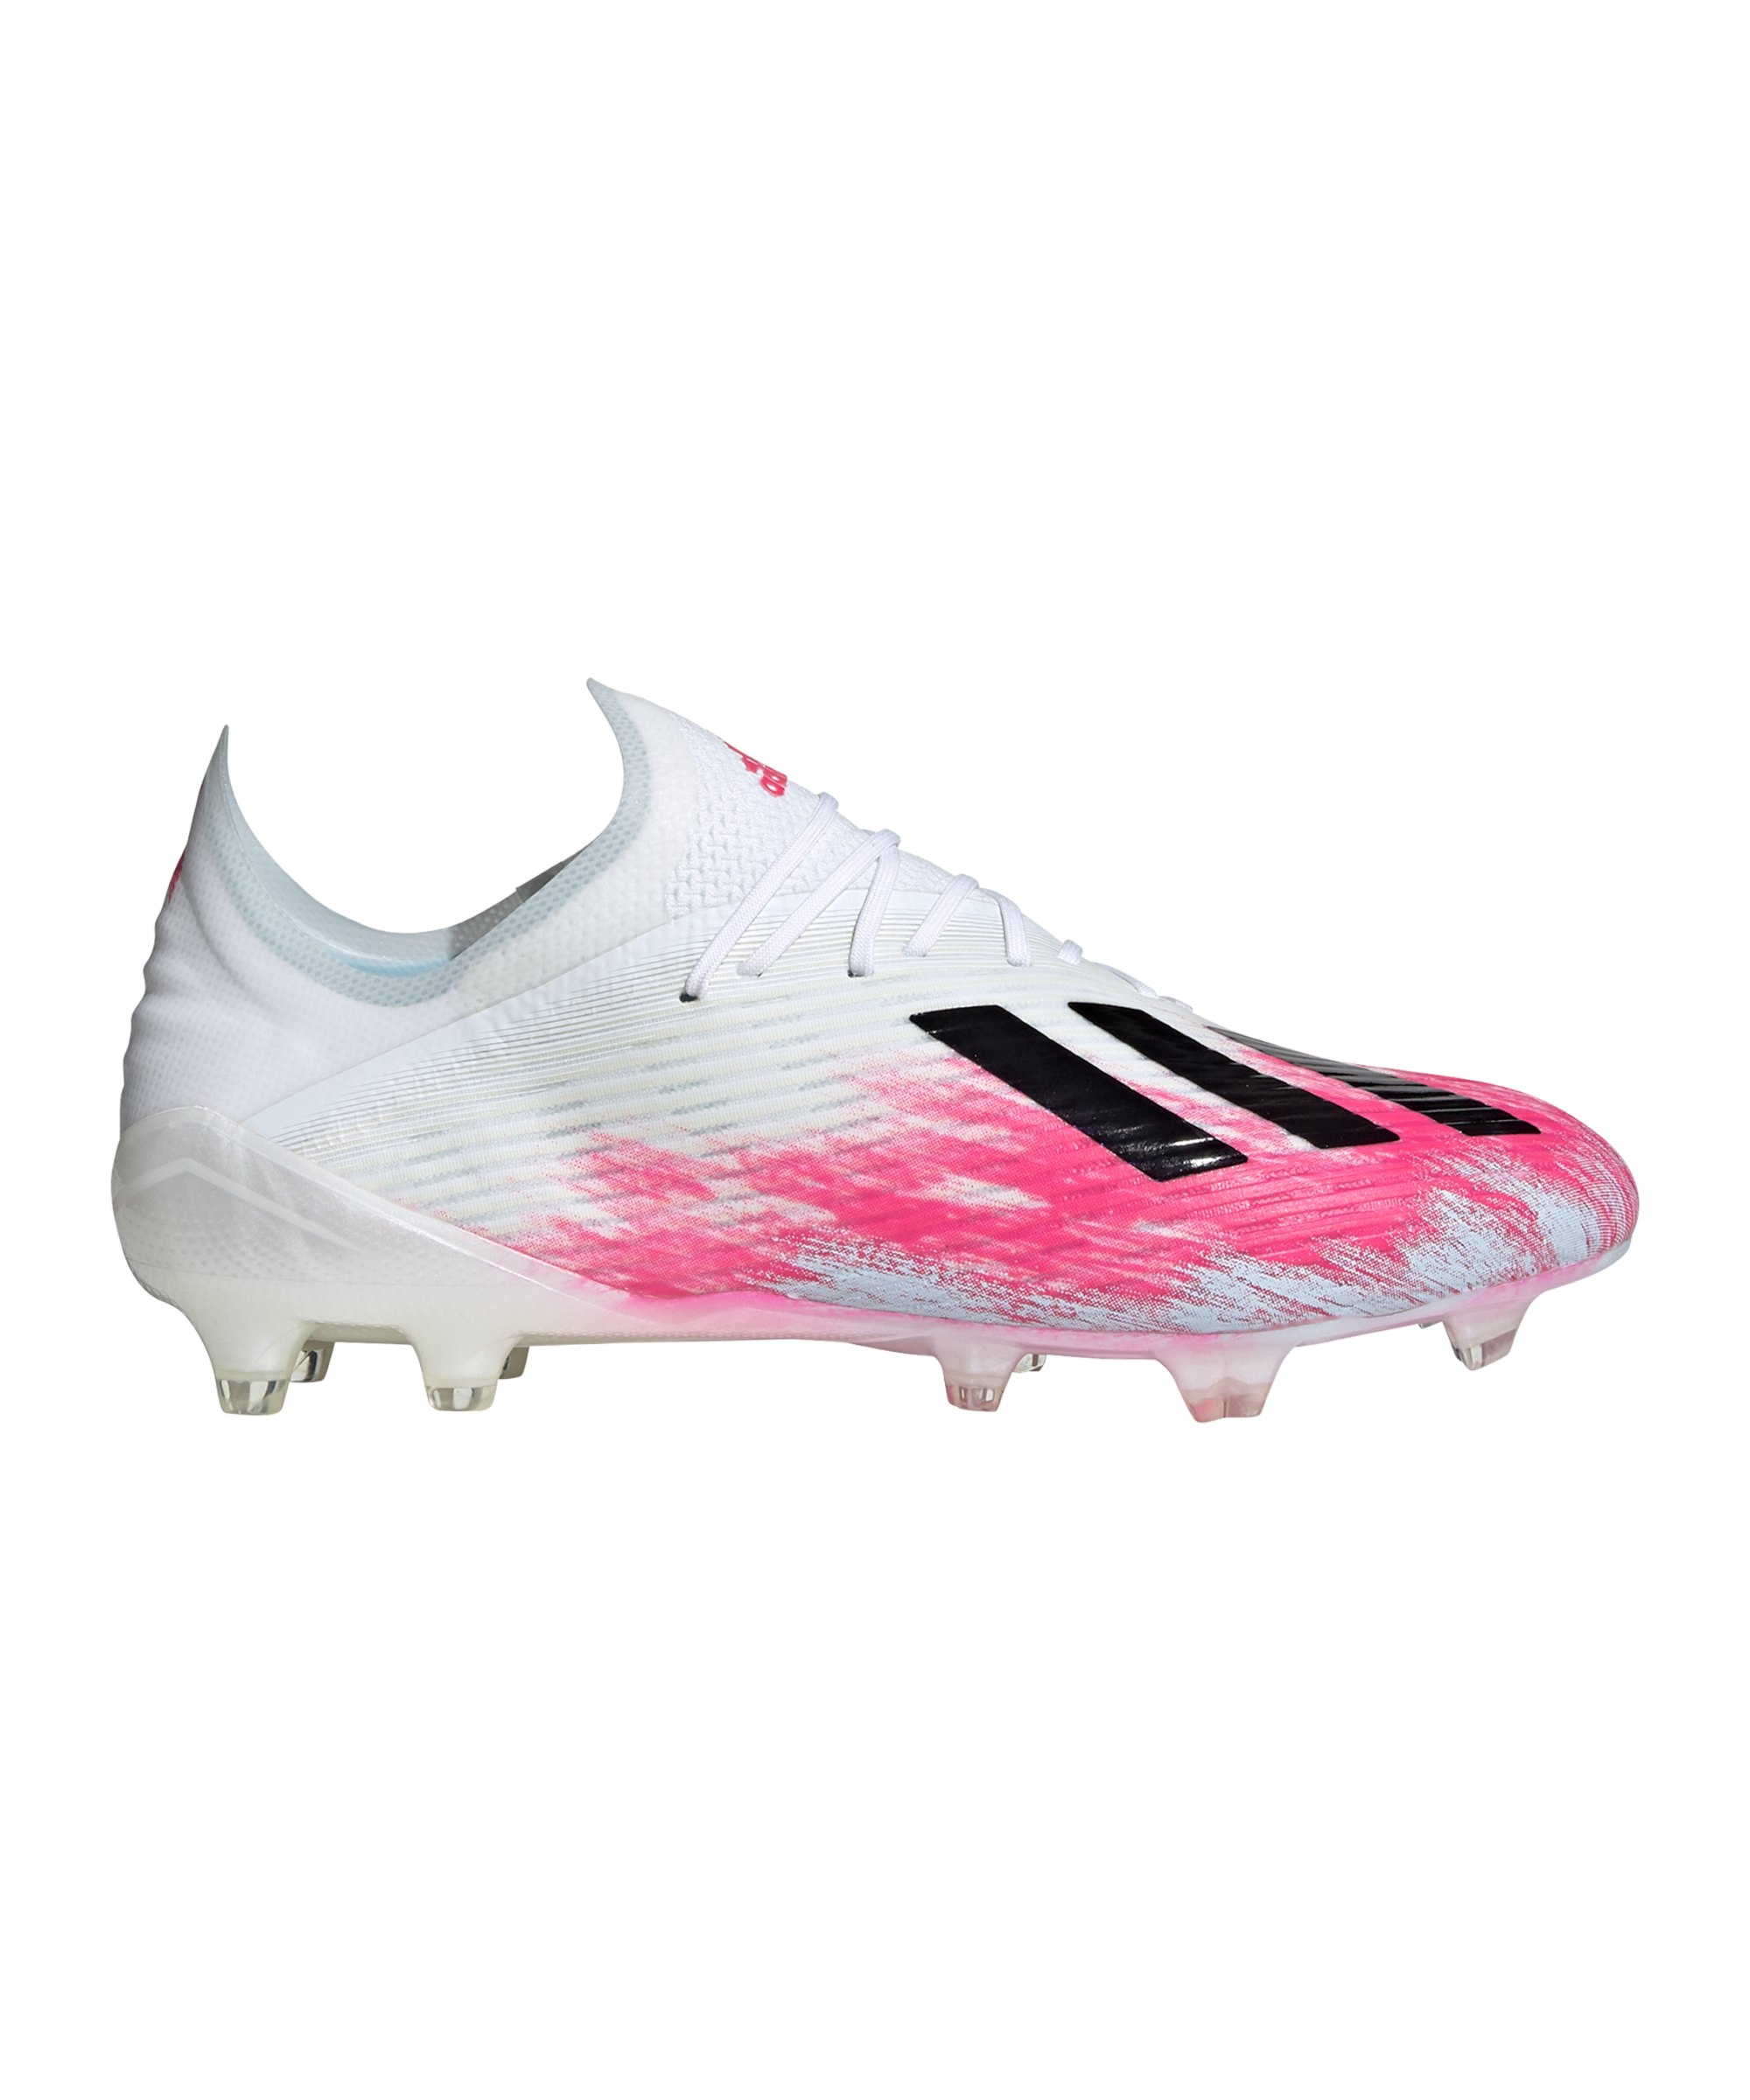 Adidas X Uniforia 19.1 FG Weiss Pink